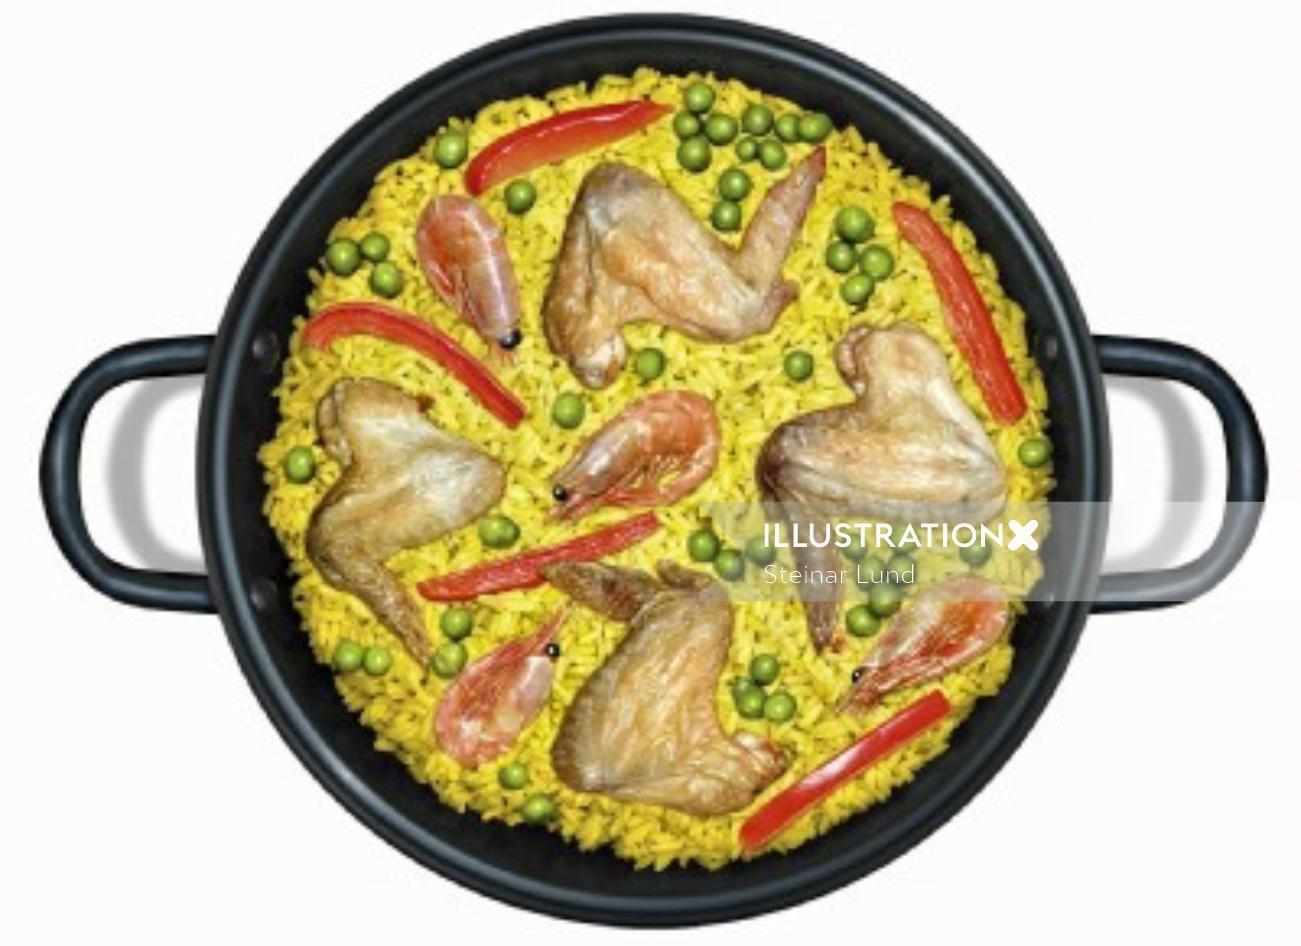 illustration of food paella by Steinar Lund